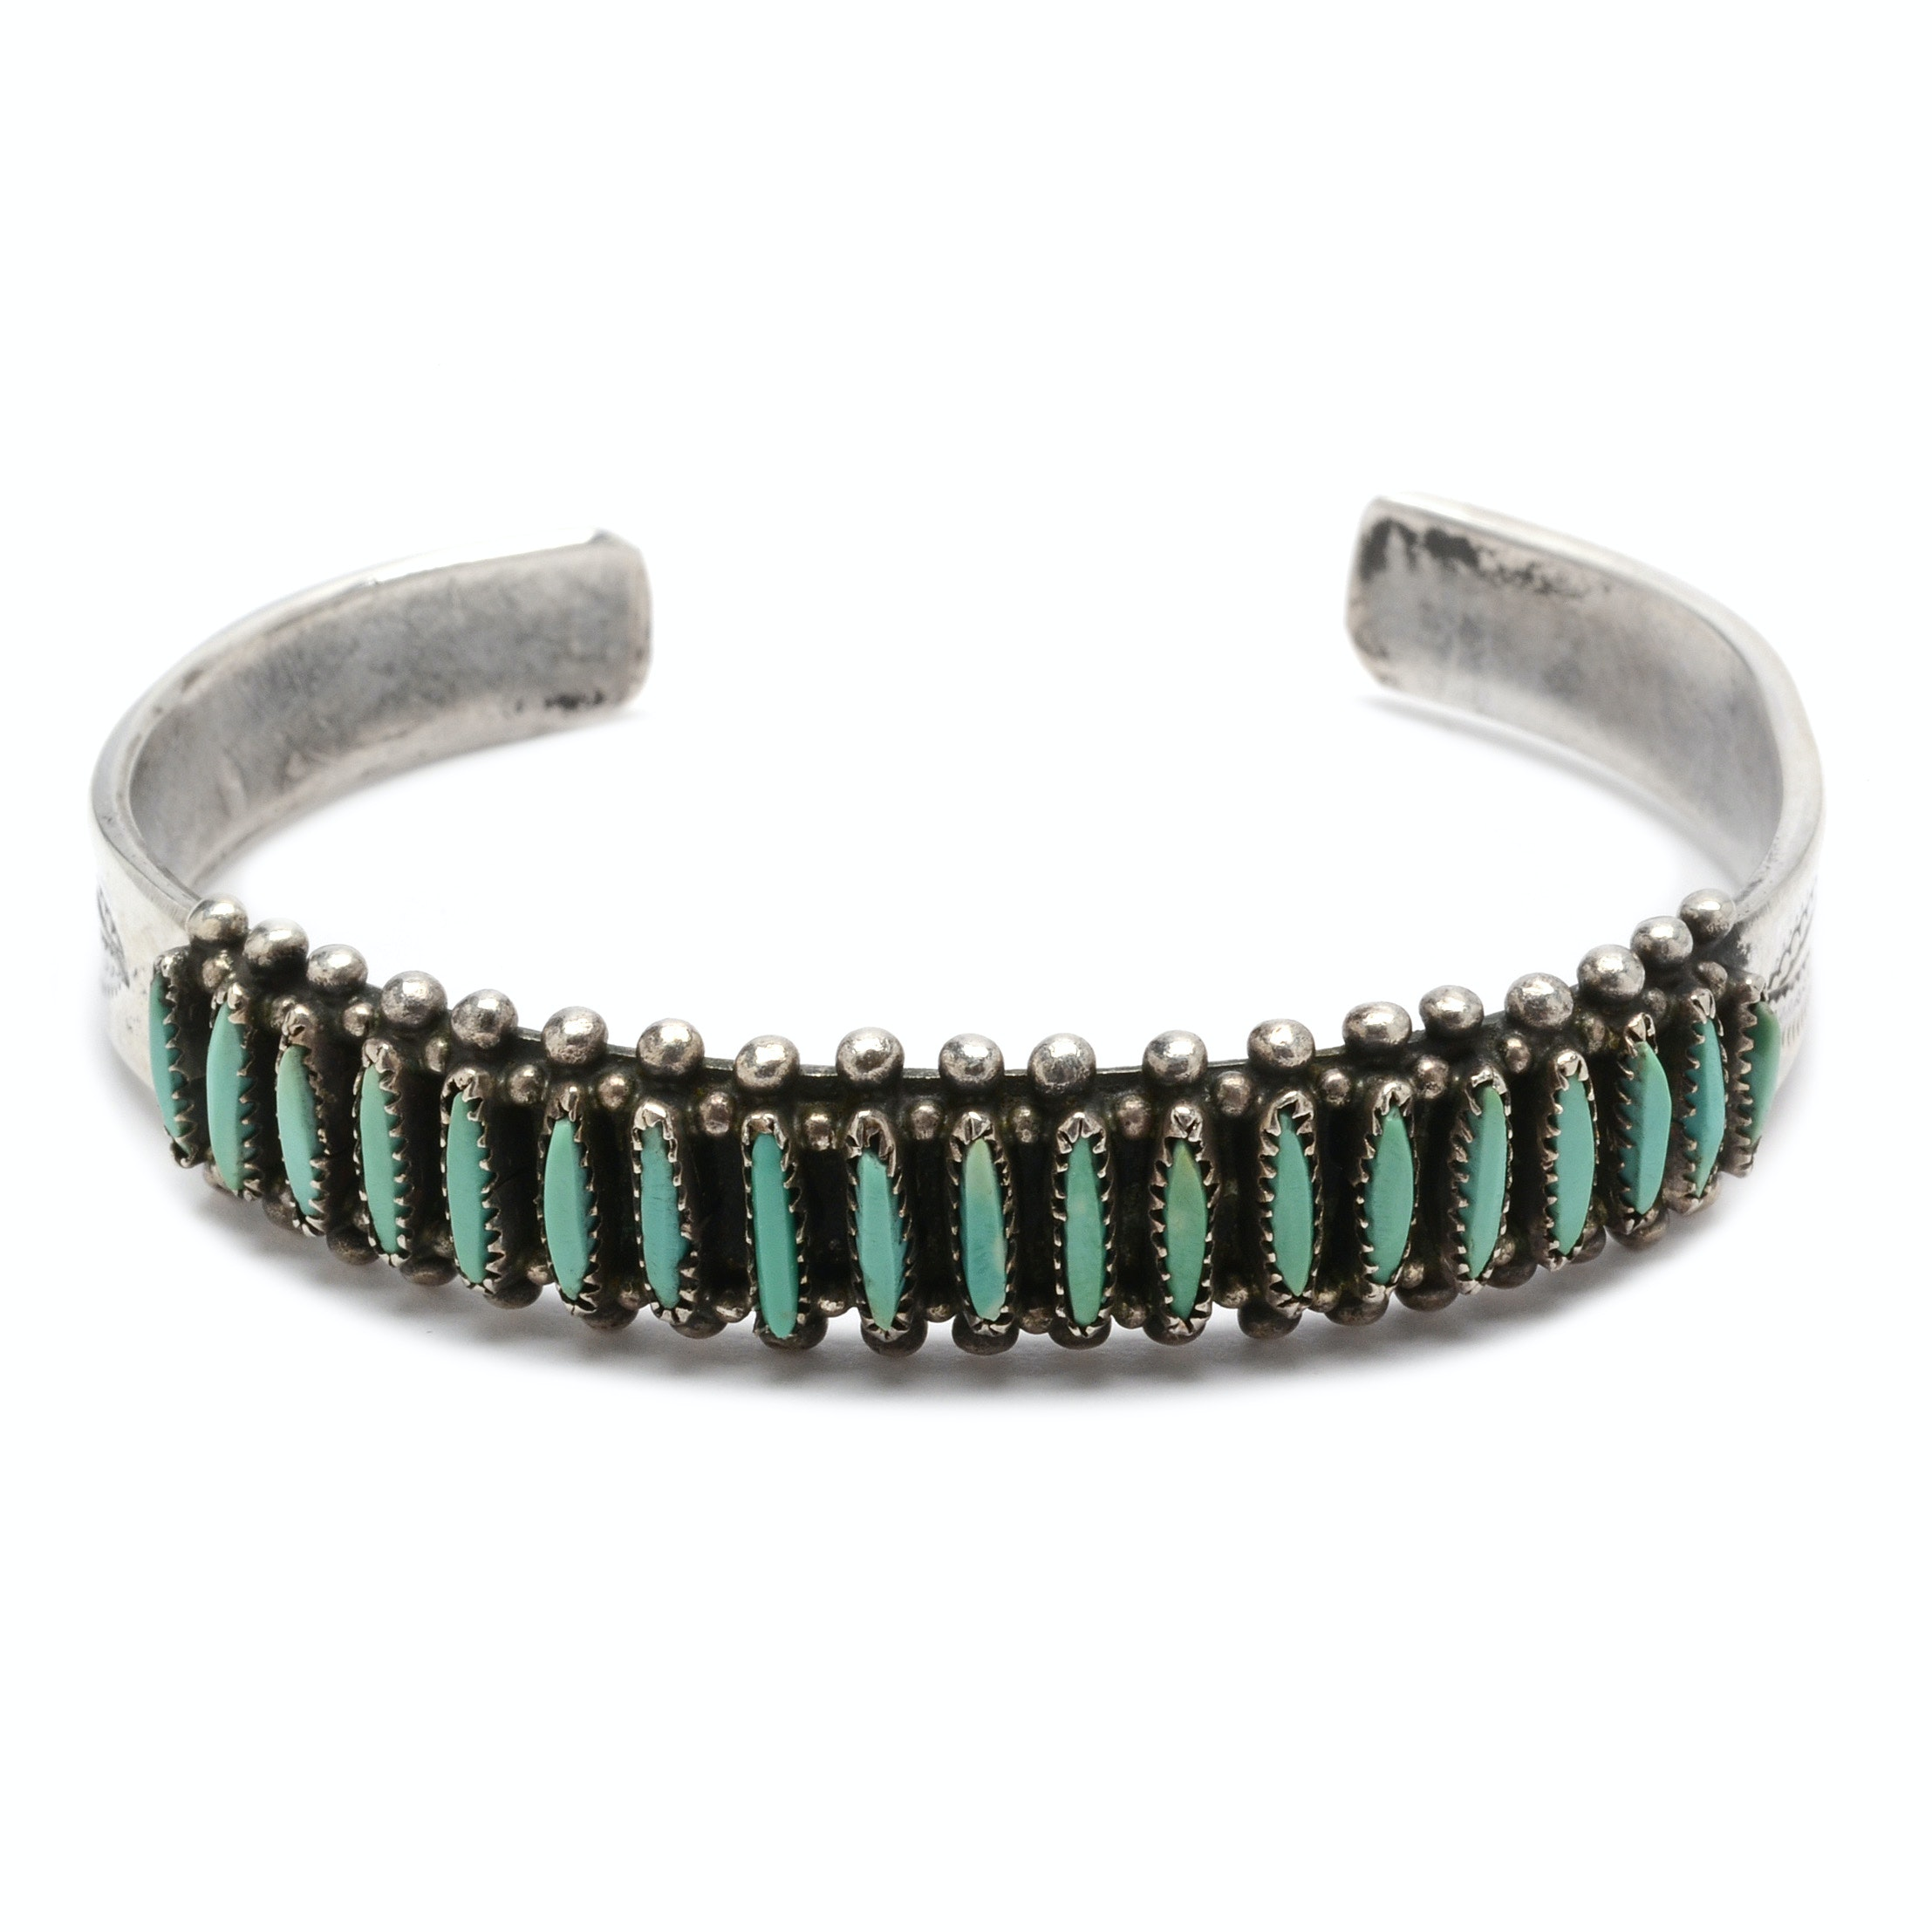 Sterling Silver Turquoise Southwestern Style Needlepoint Cuff Bracelet